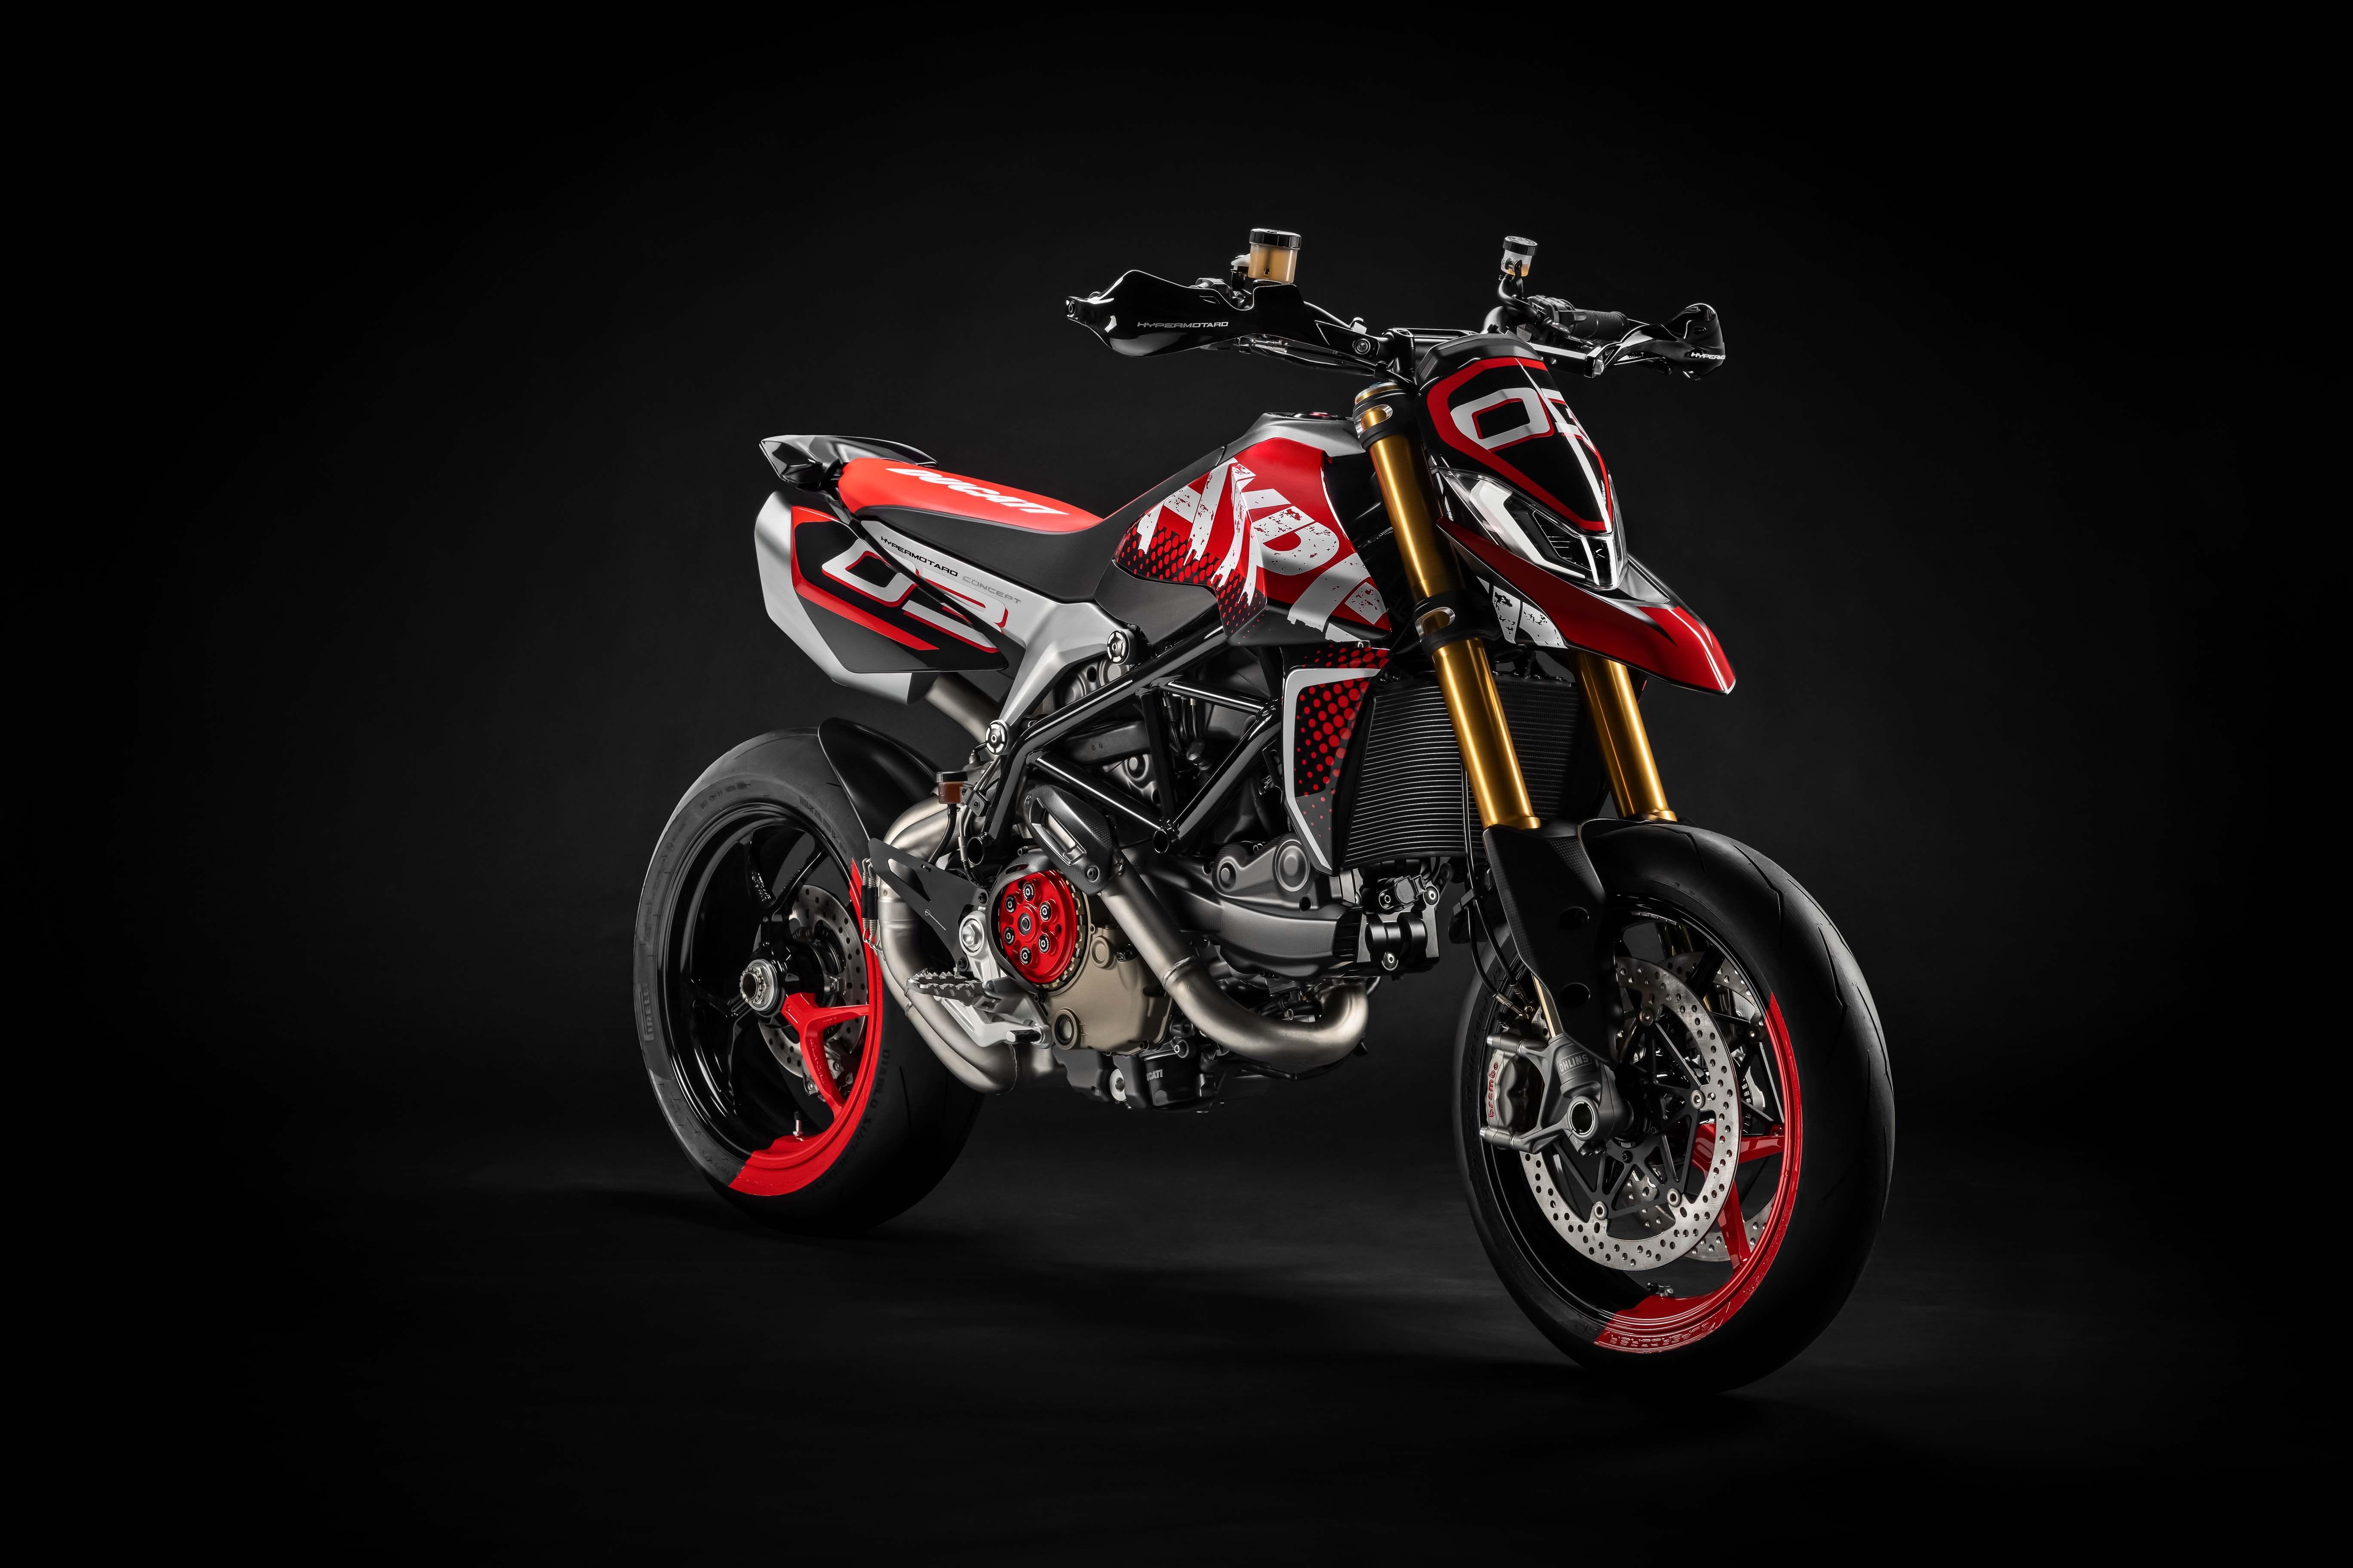 HDoboi.Kiev.ua - Ducati Hypermotard 950 на черном фоне, заставка HD ultra 5k